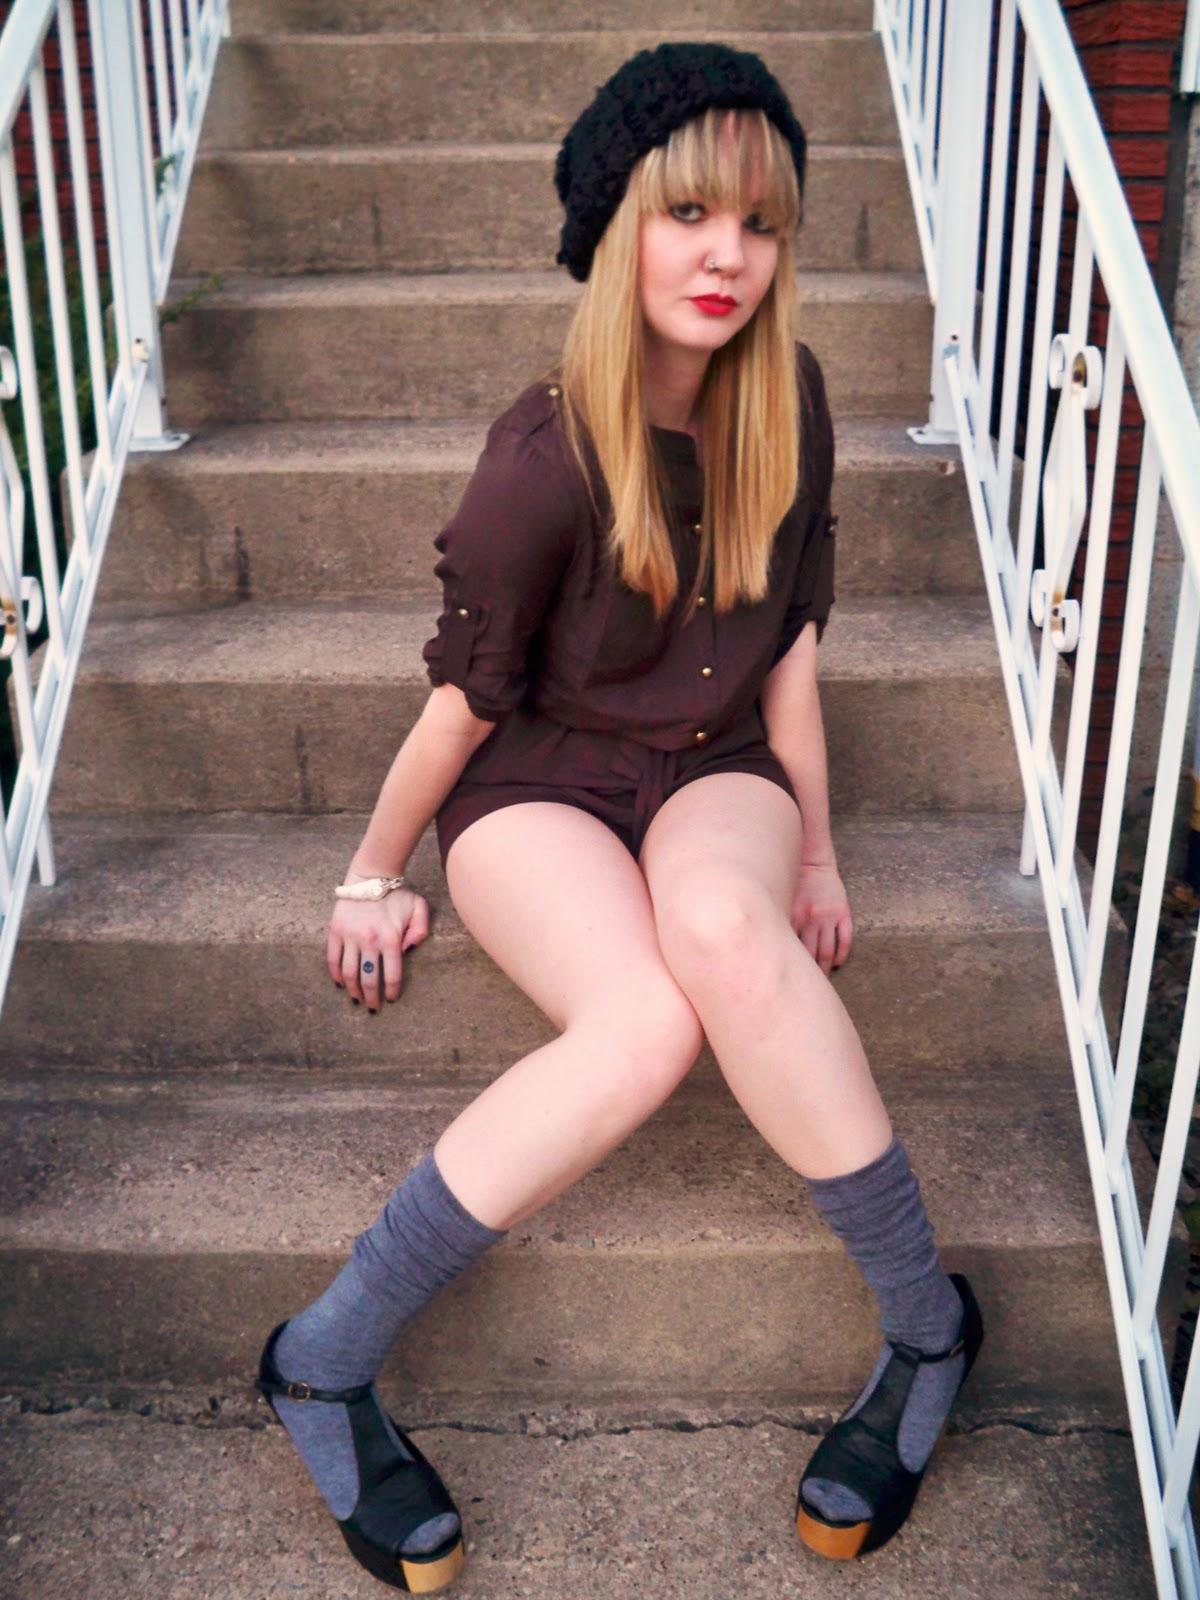 Russian sex photo blog — photo 11